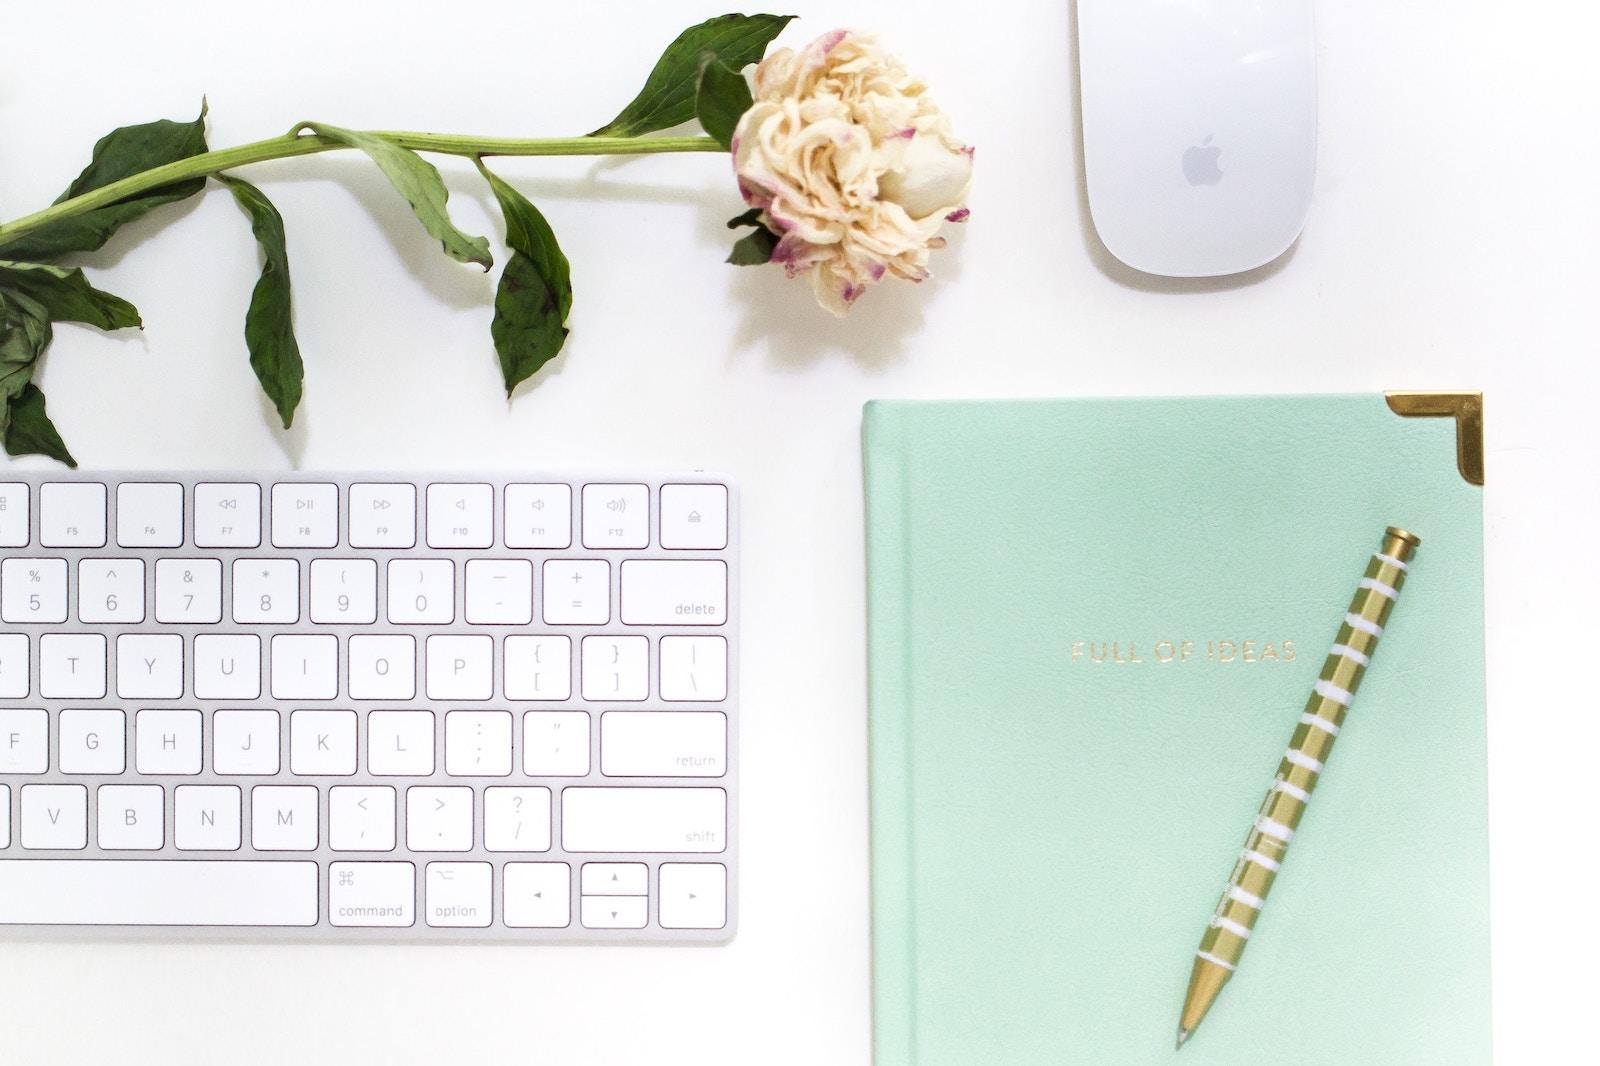 social-media-detox-desk-layout-rose-keyboard-notebook